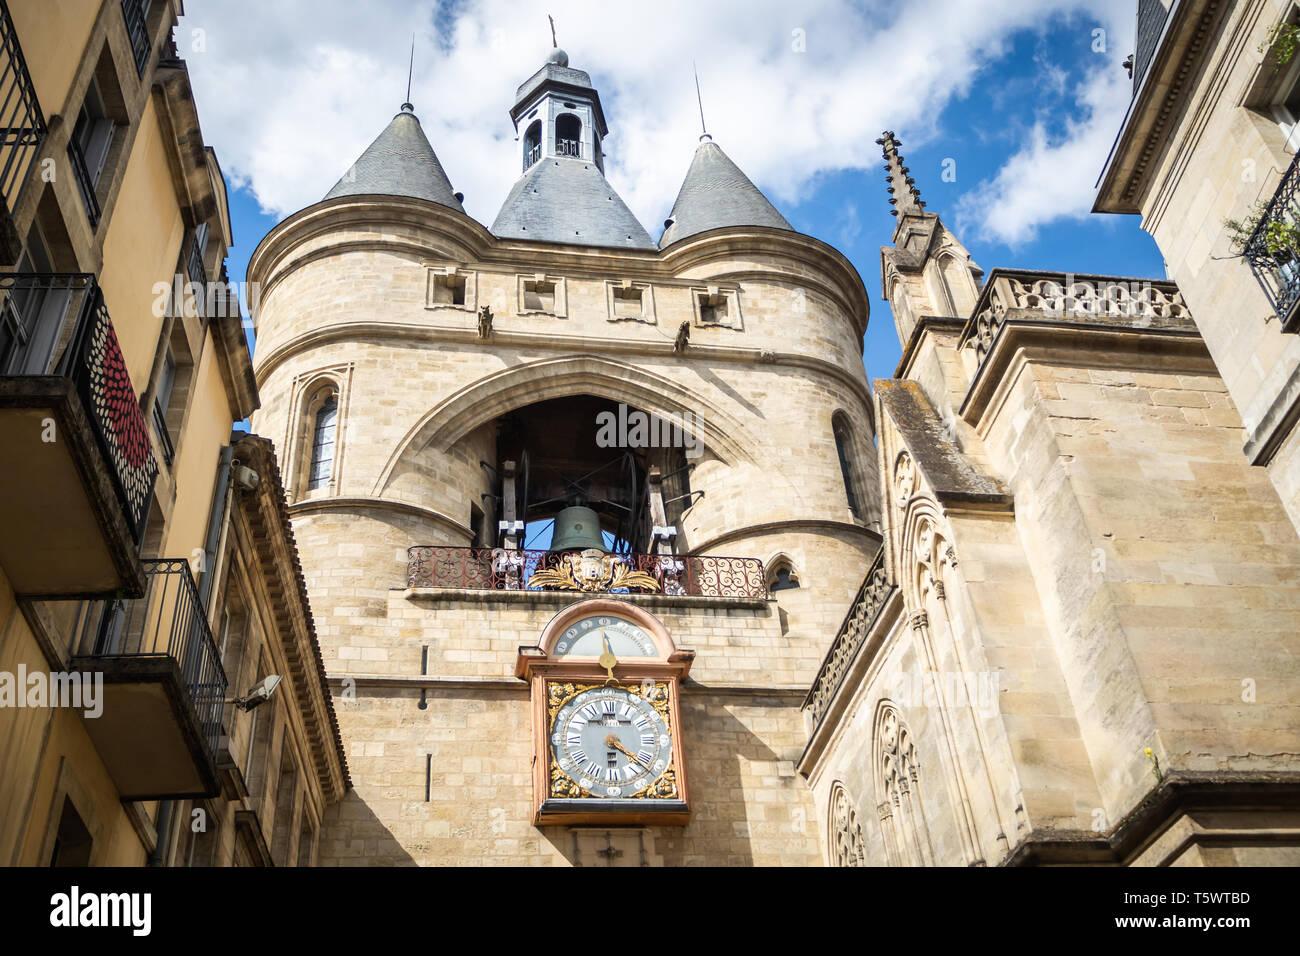 Parish Church of Saint Eloi in Bordeaux - Stock Image